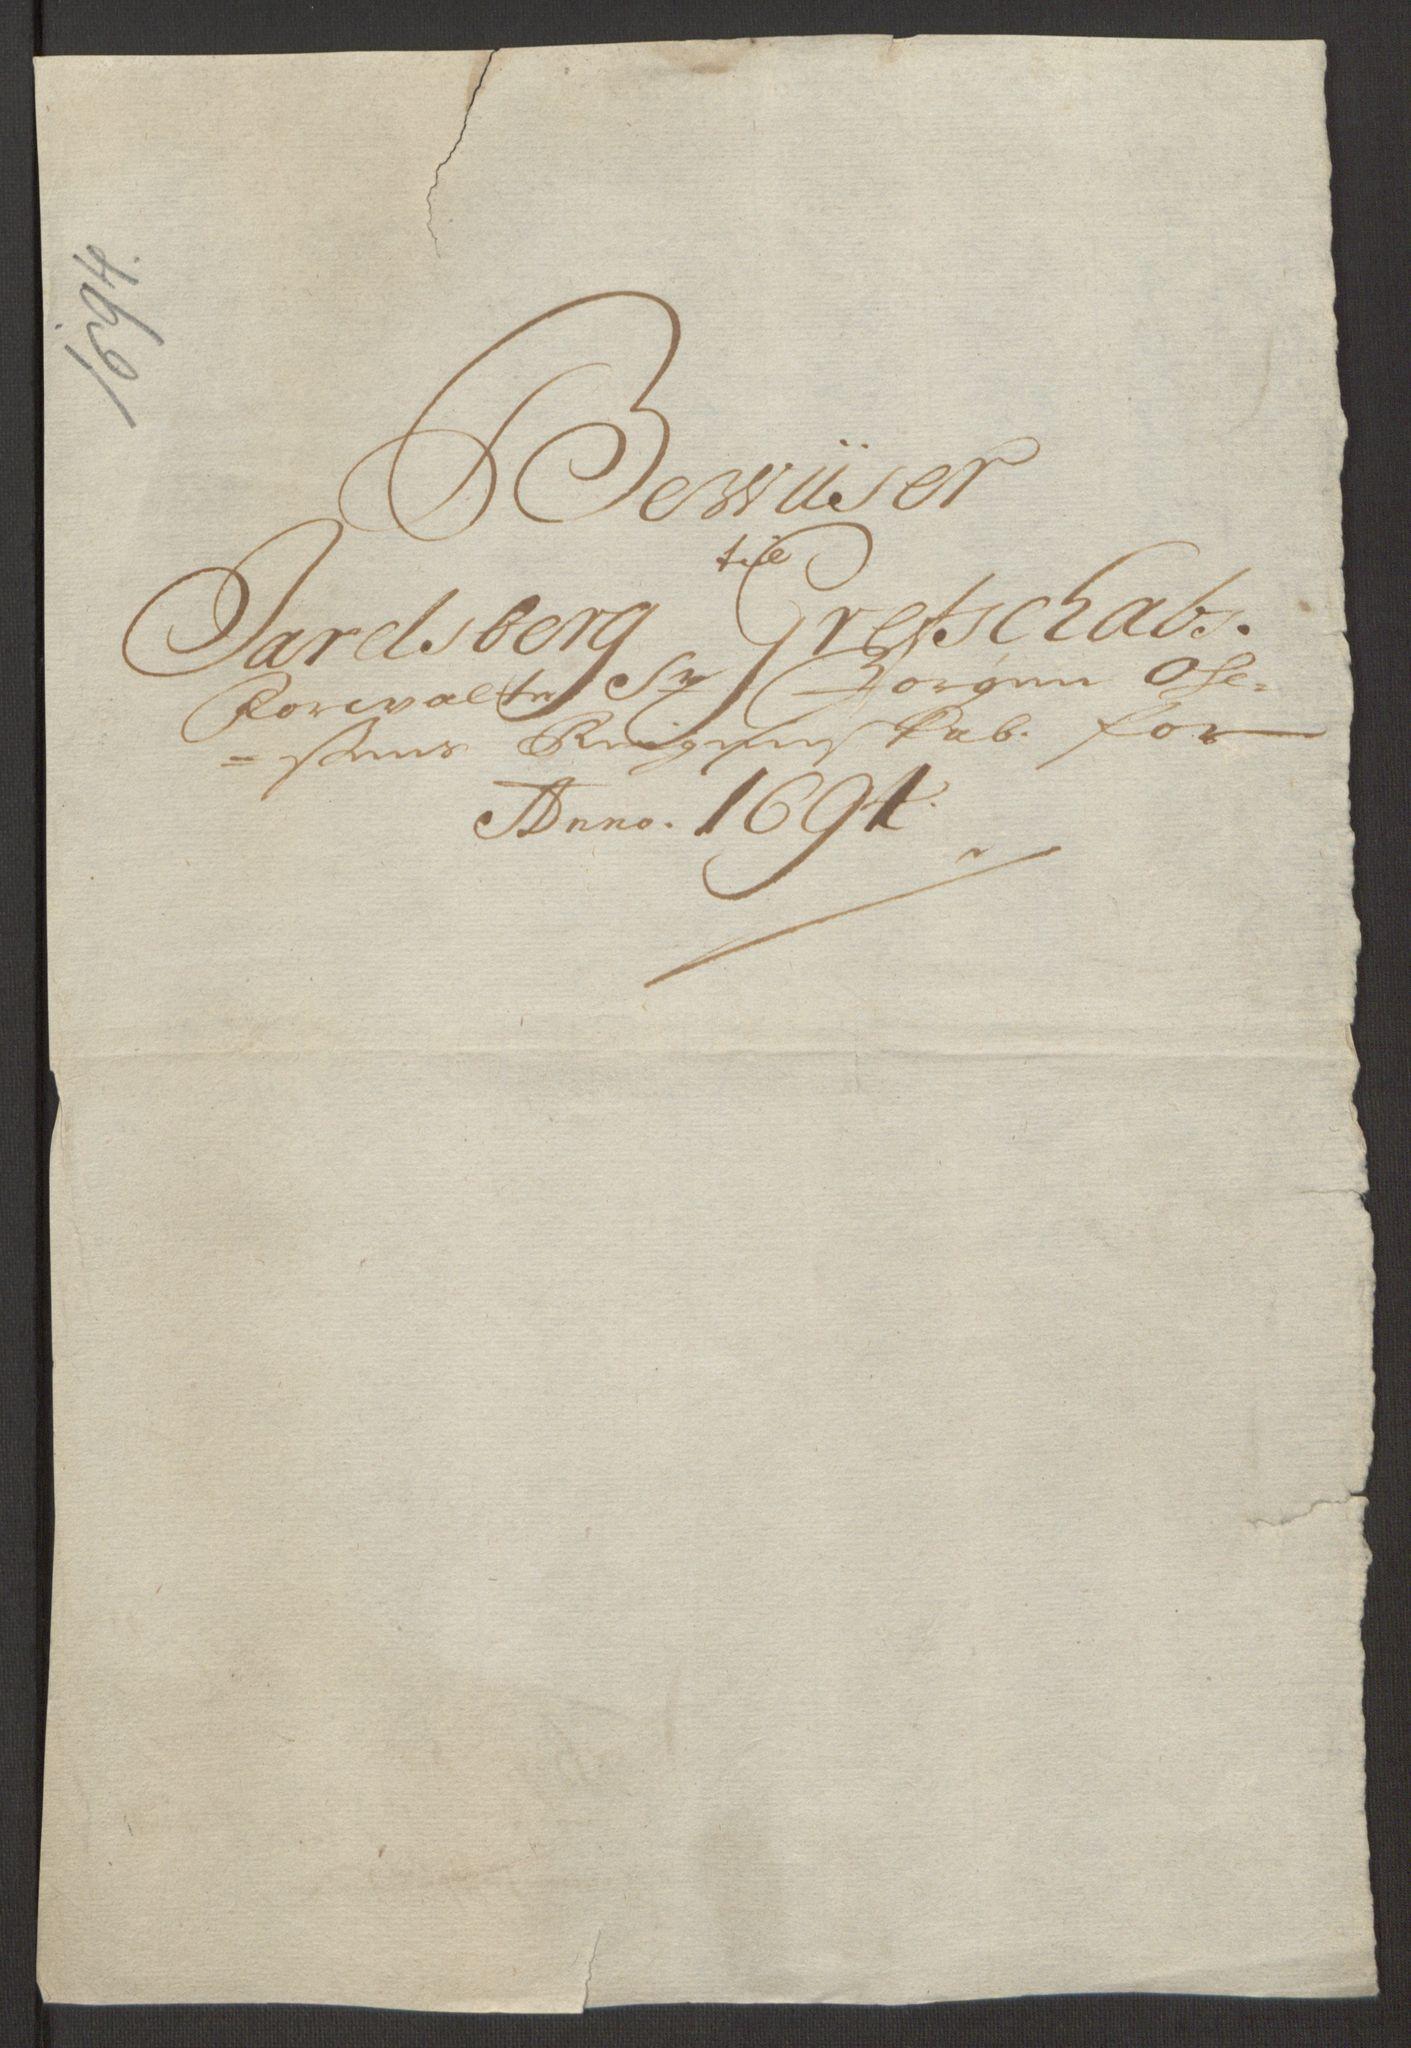 RA, Rentekammeret inntil 1814, Reviderte regnskaper, Fogderegnskap, R32/L1867: Fogderegnskap Jarlsberg grevskap, 1694-1696, s. 76